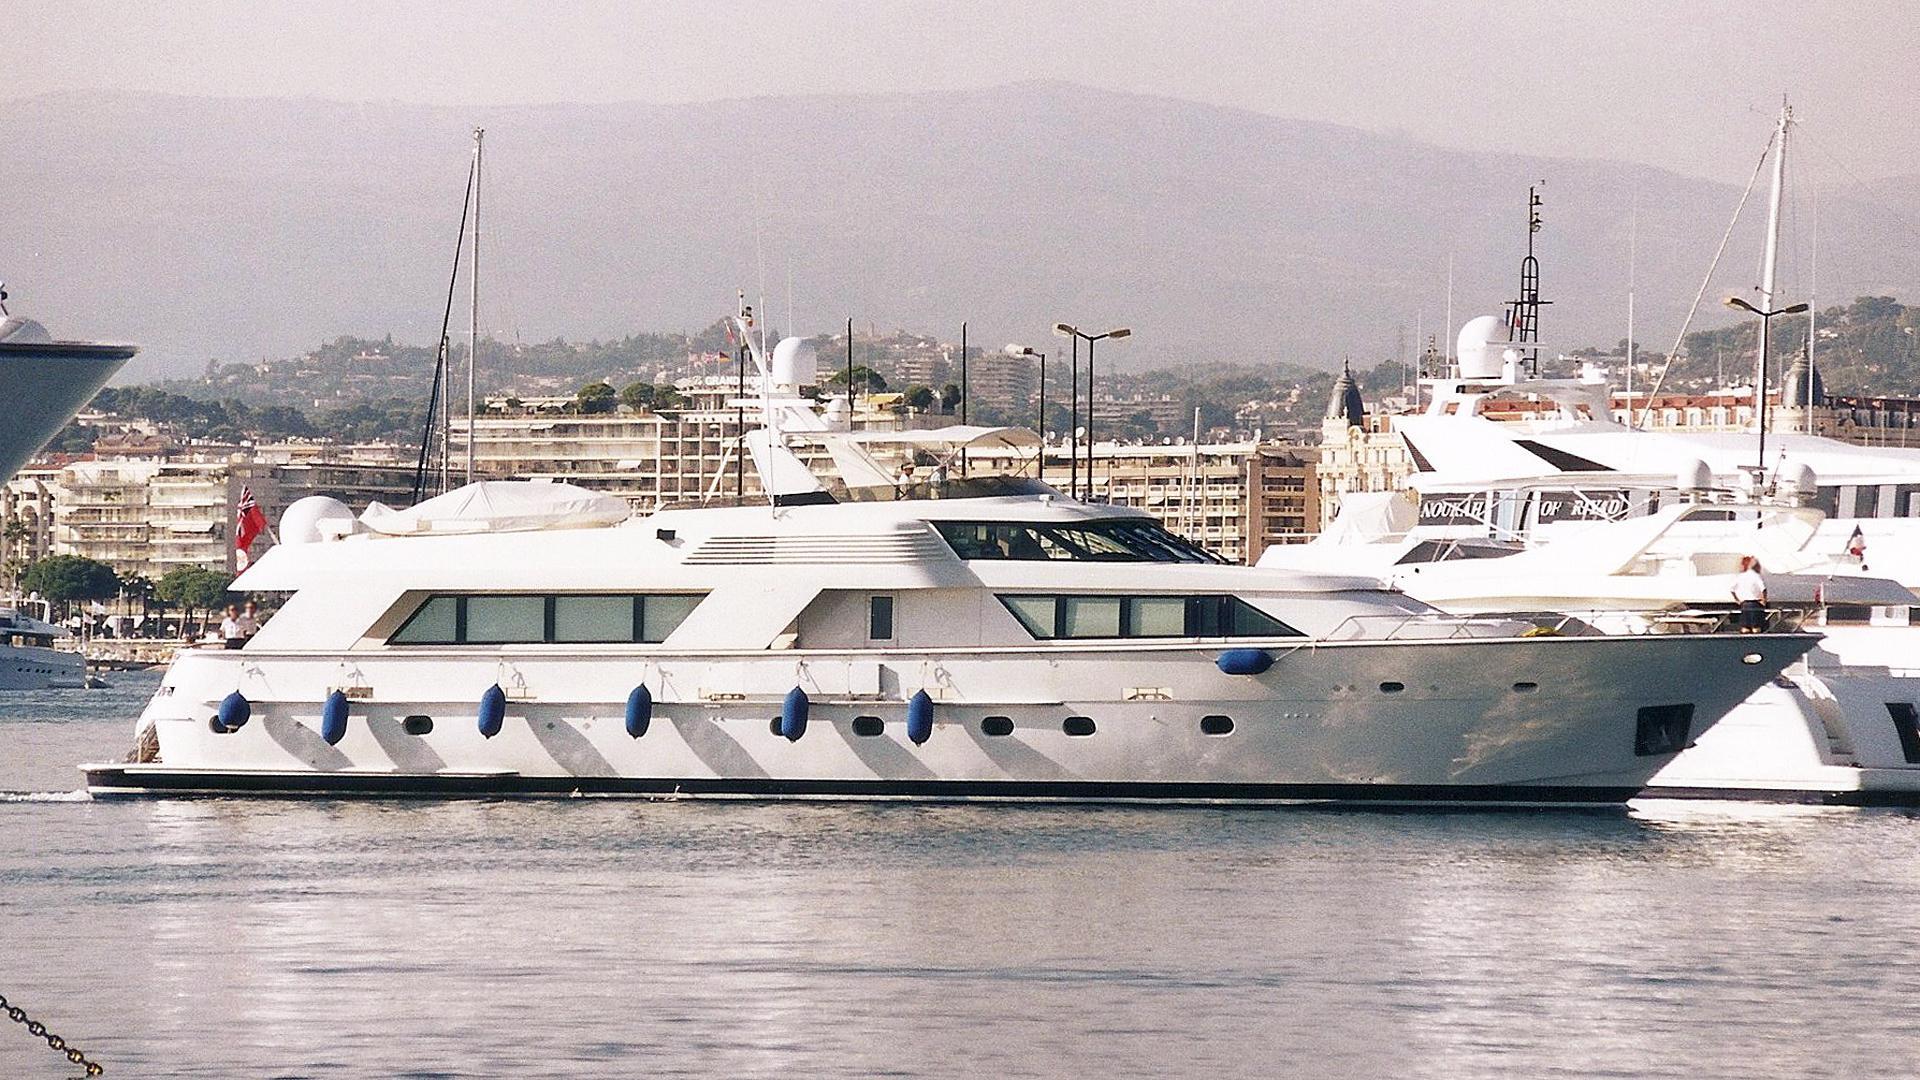 victoria-motor-yacht-hatteras-107-1991-33m-profile